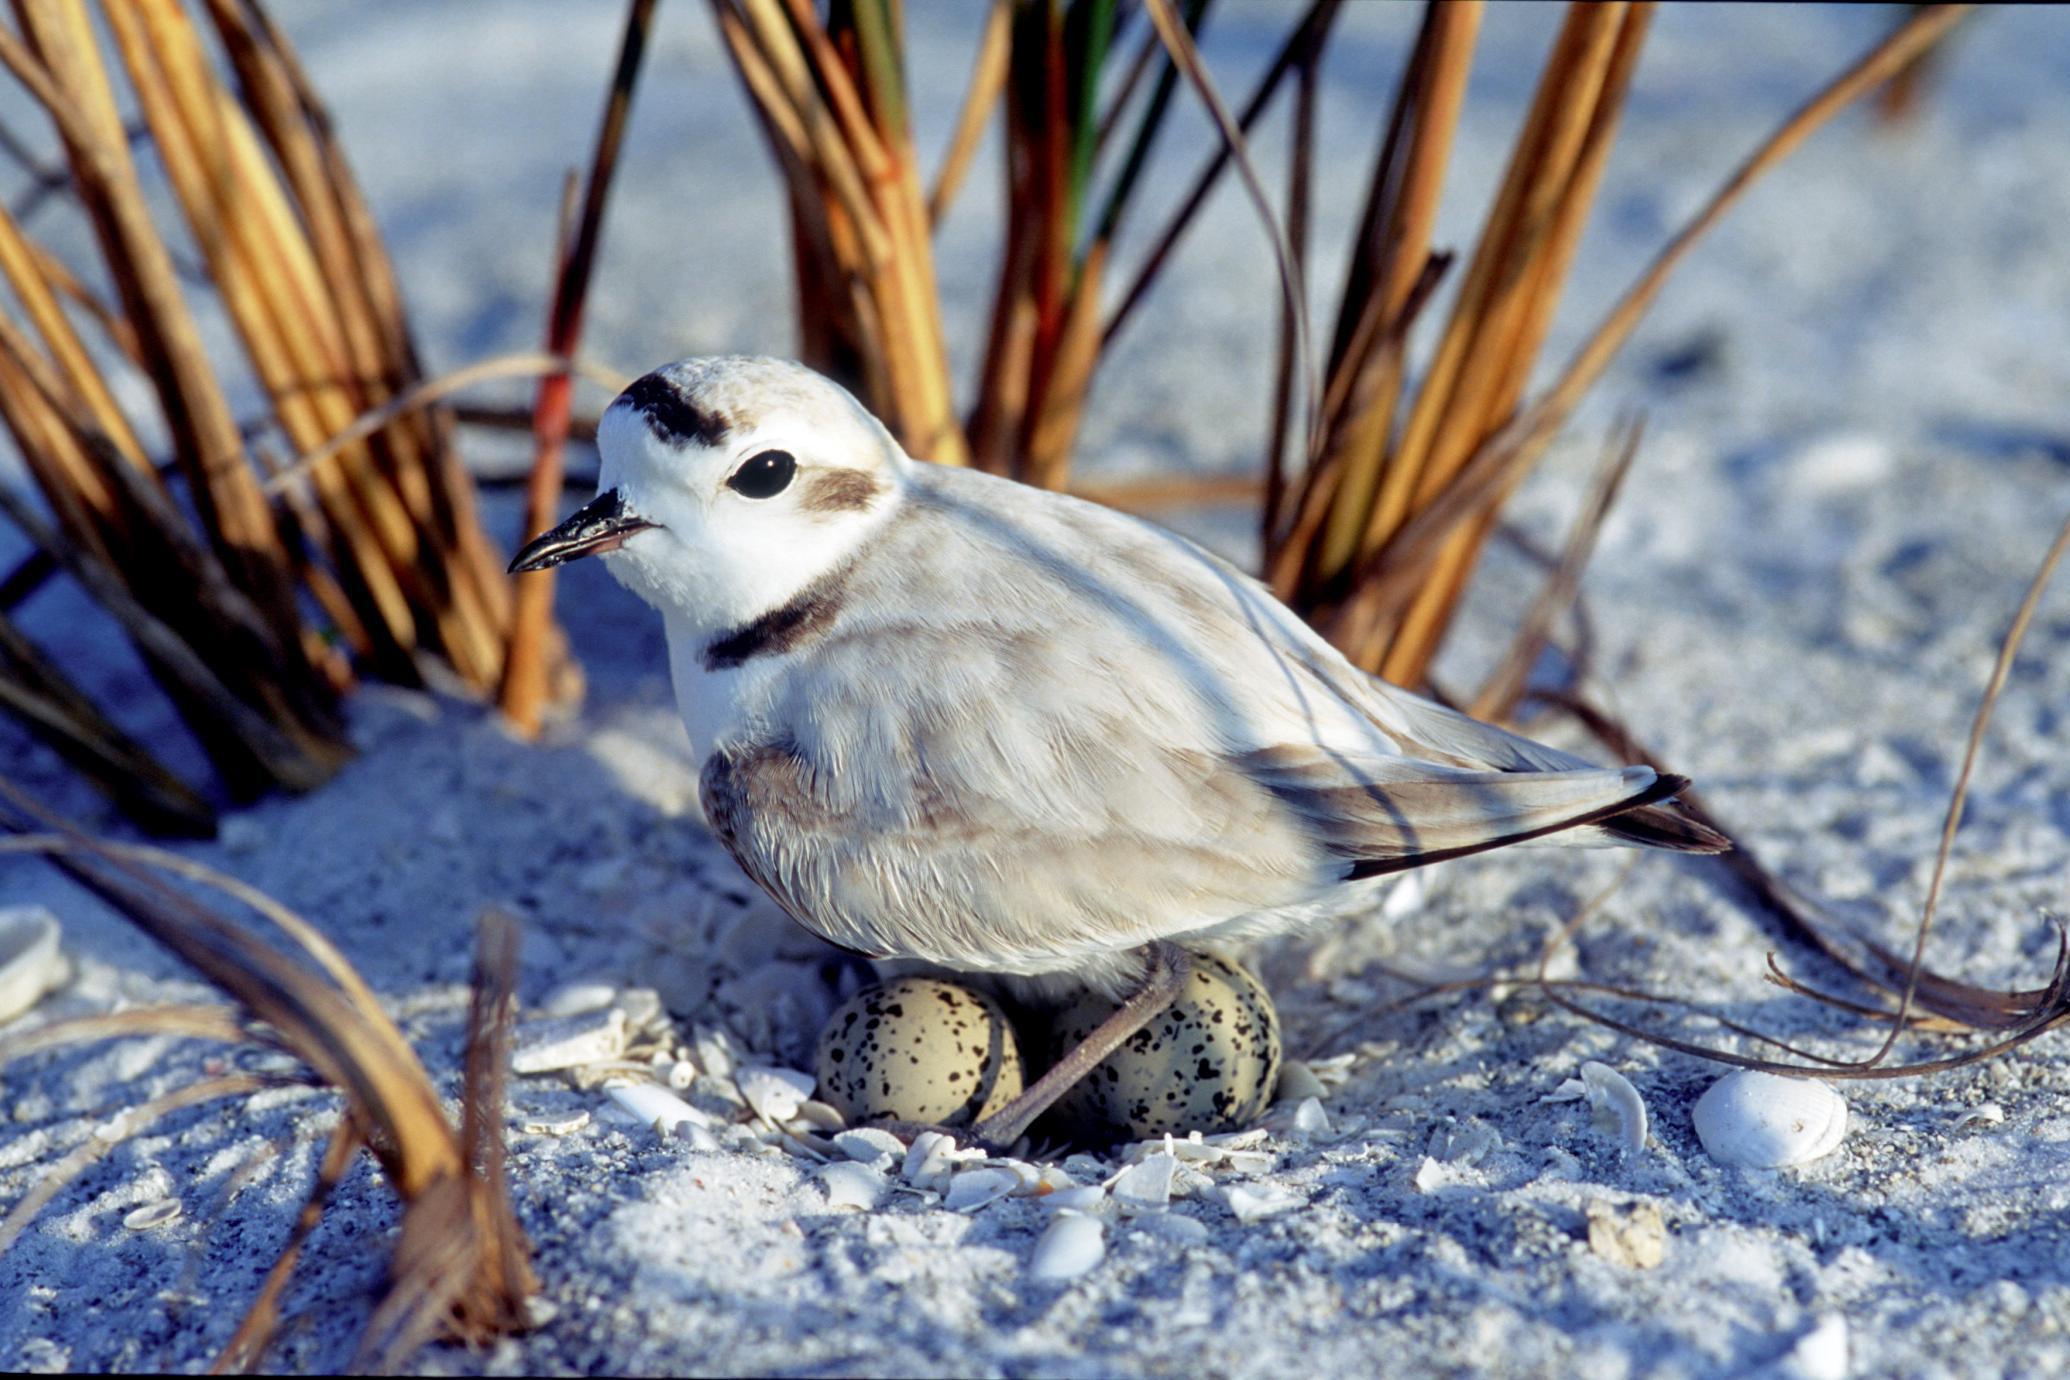 Snowy plover nesting on beach habitat.